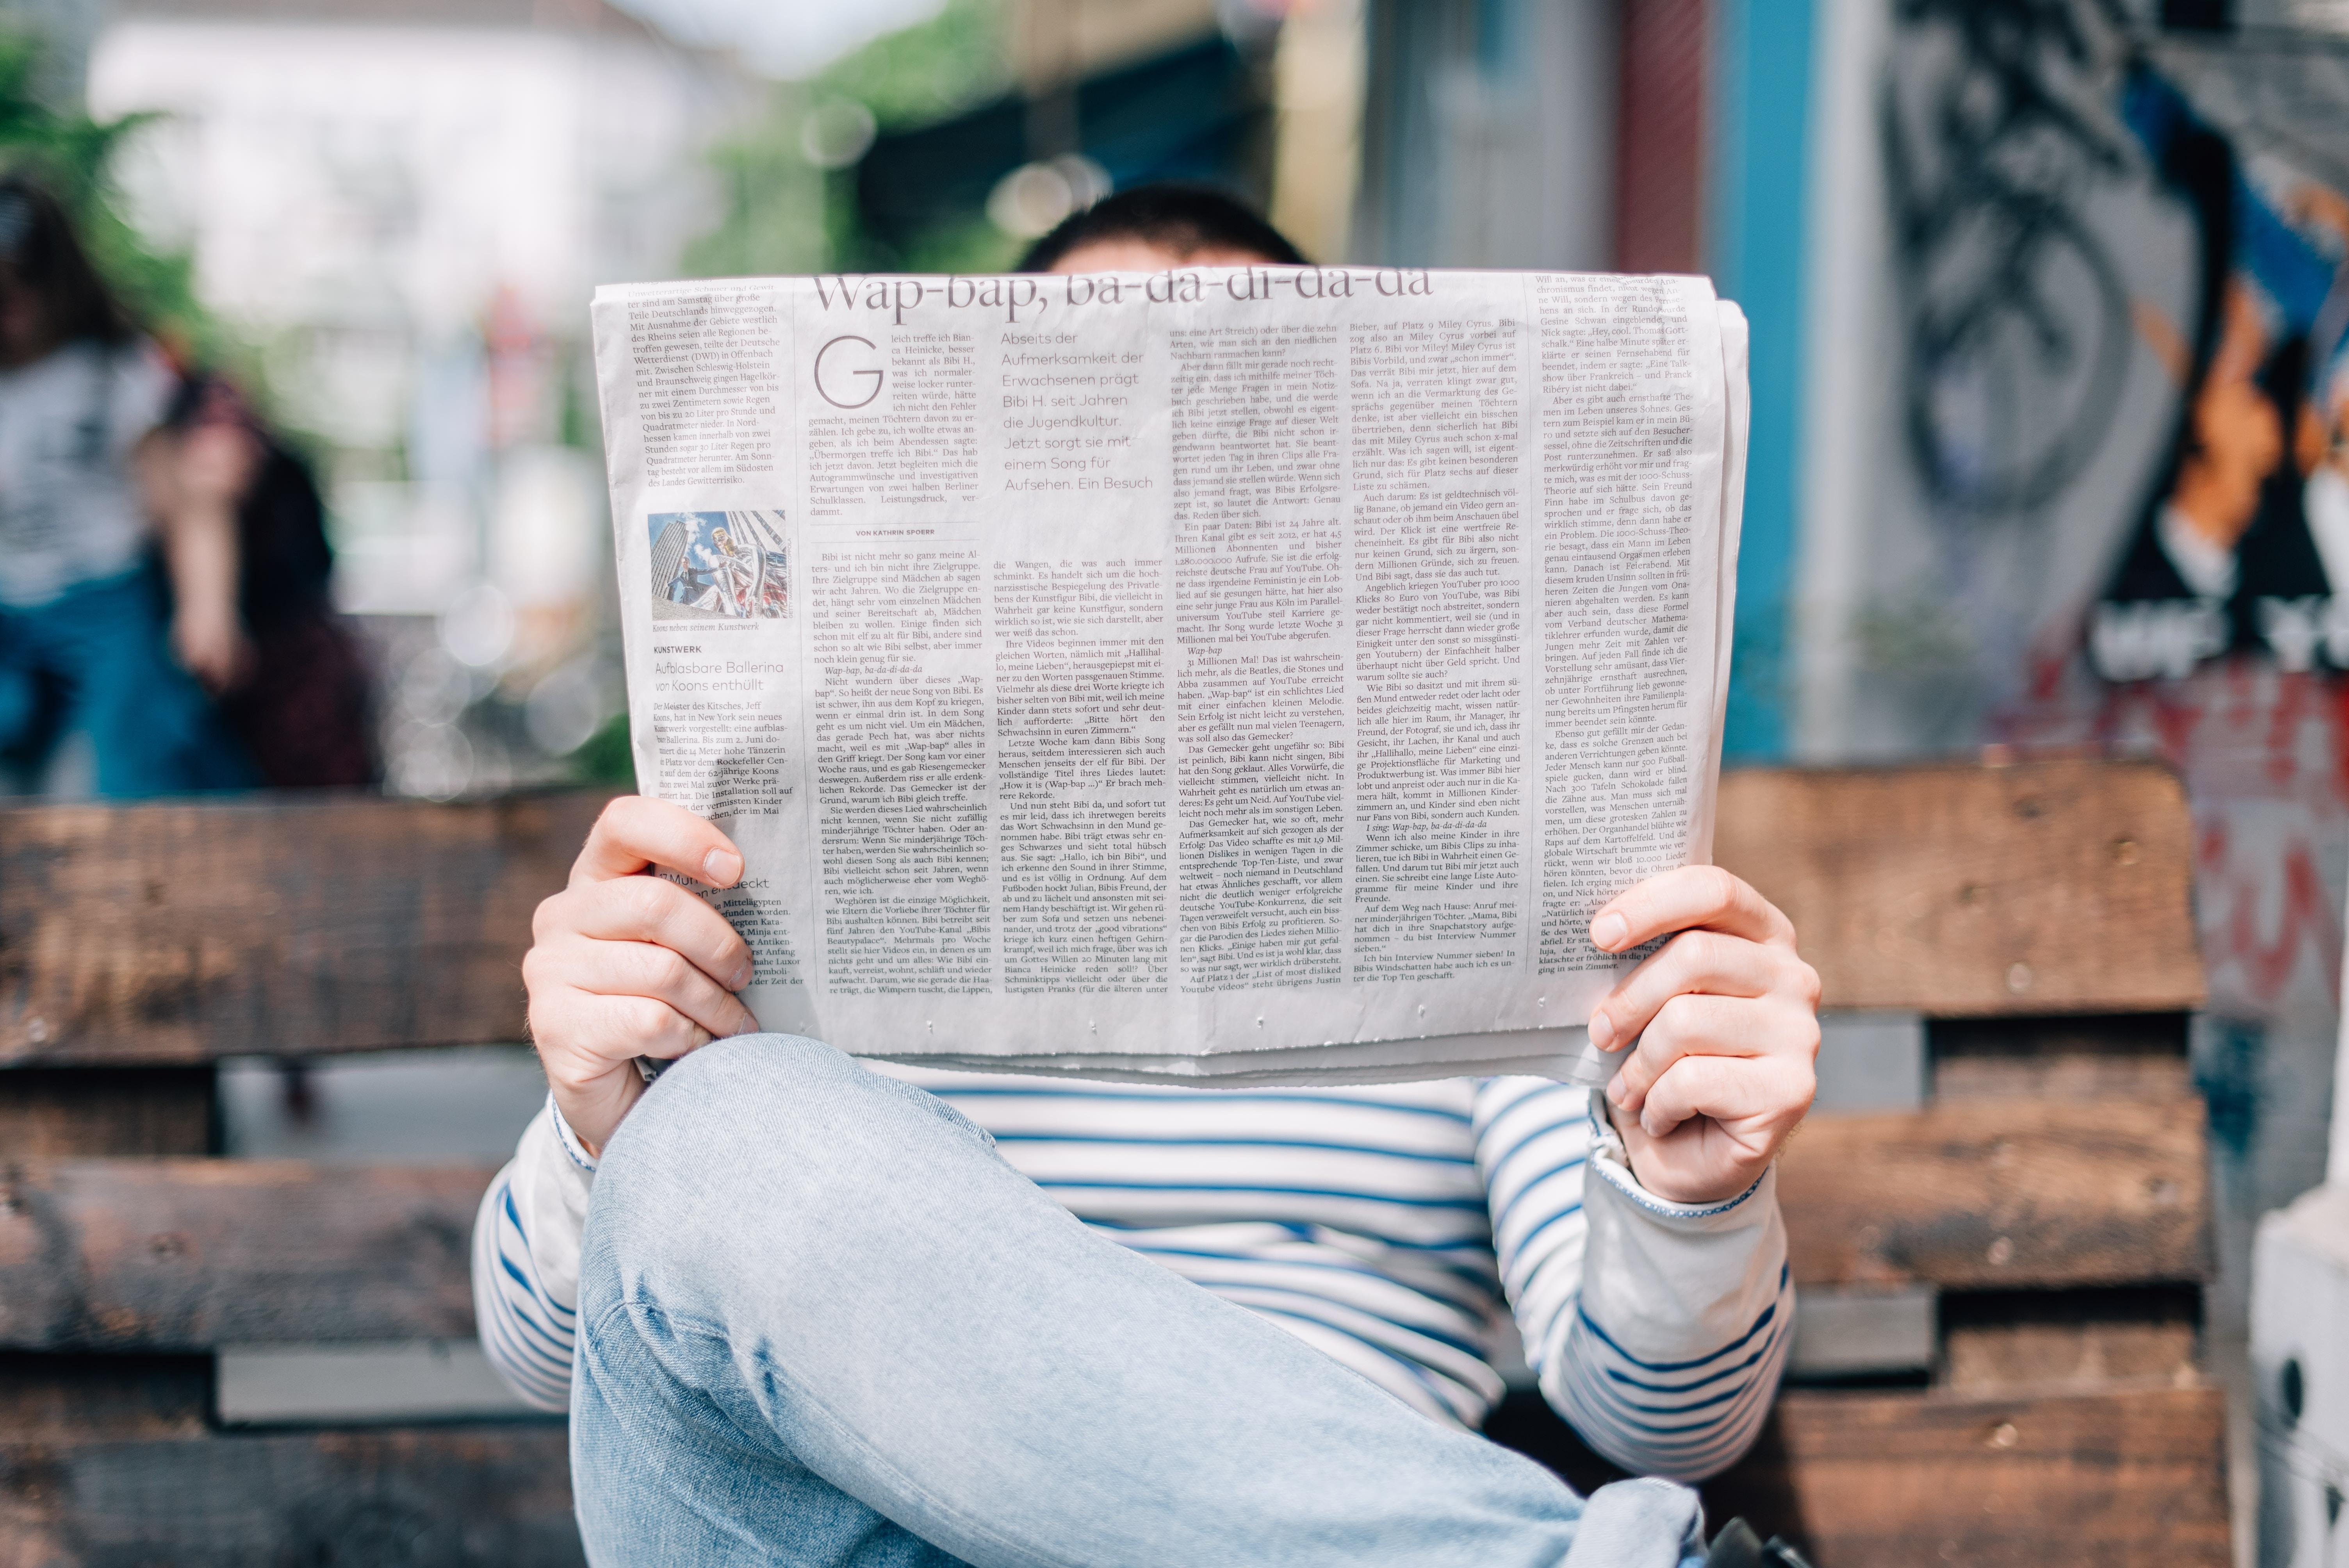 HyperLinq : Weekly Digital Asset Digest #12